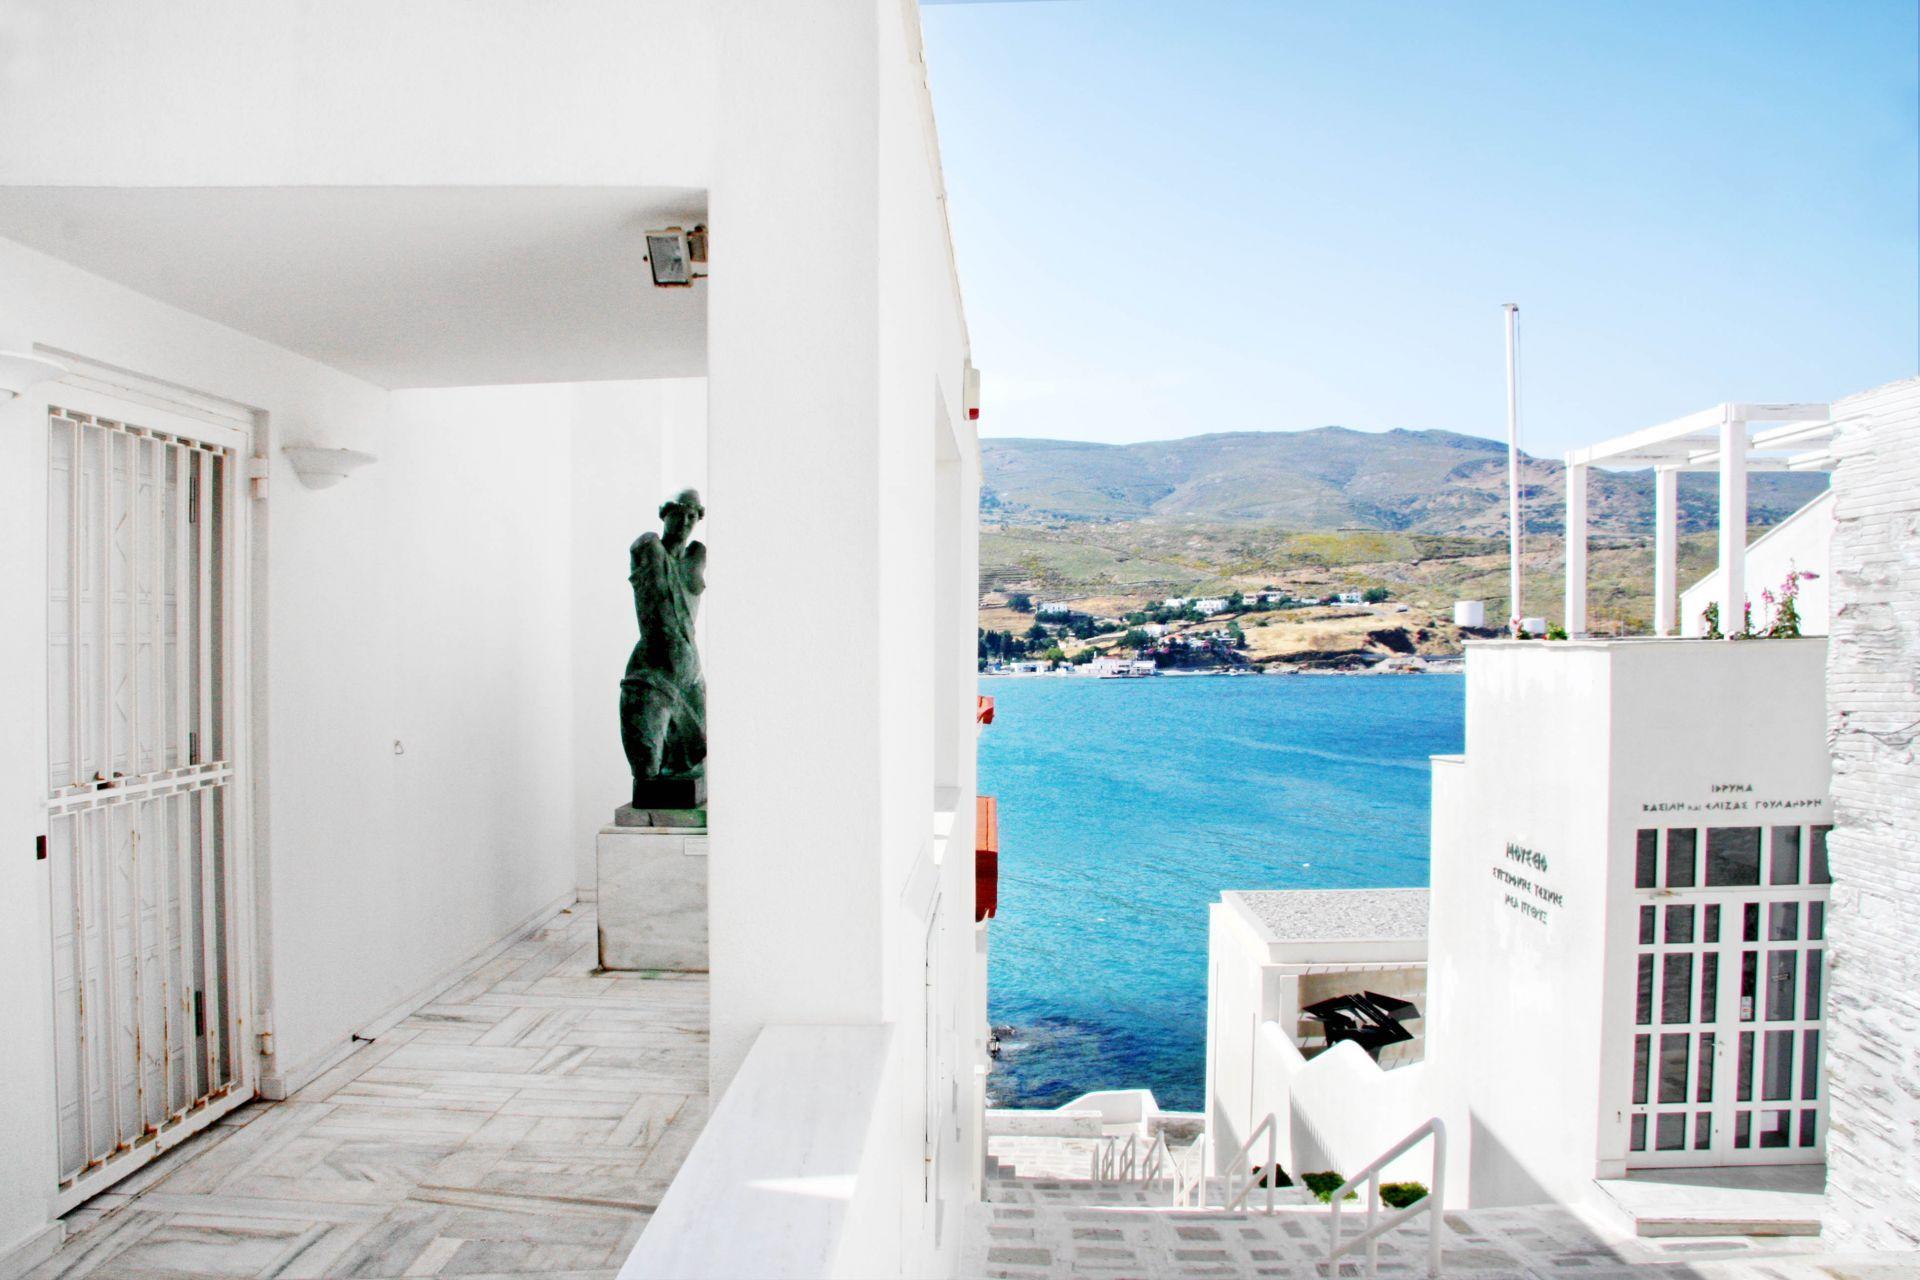 Andros island: Goulandris museum of modern art